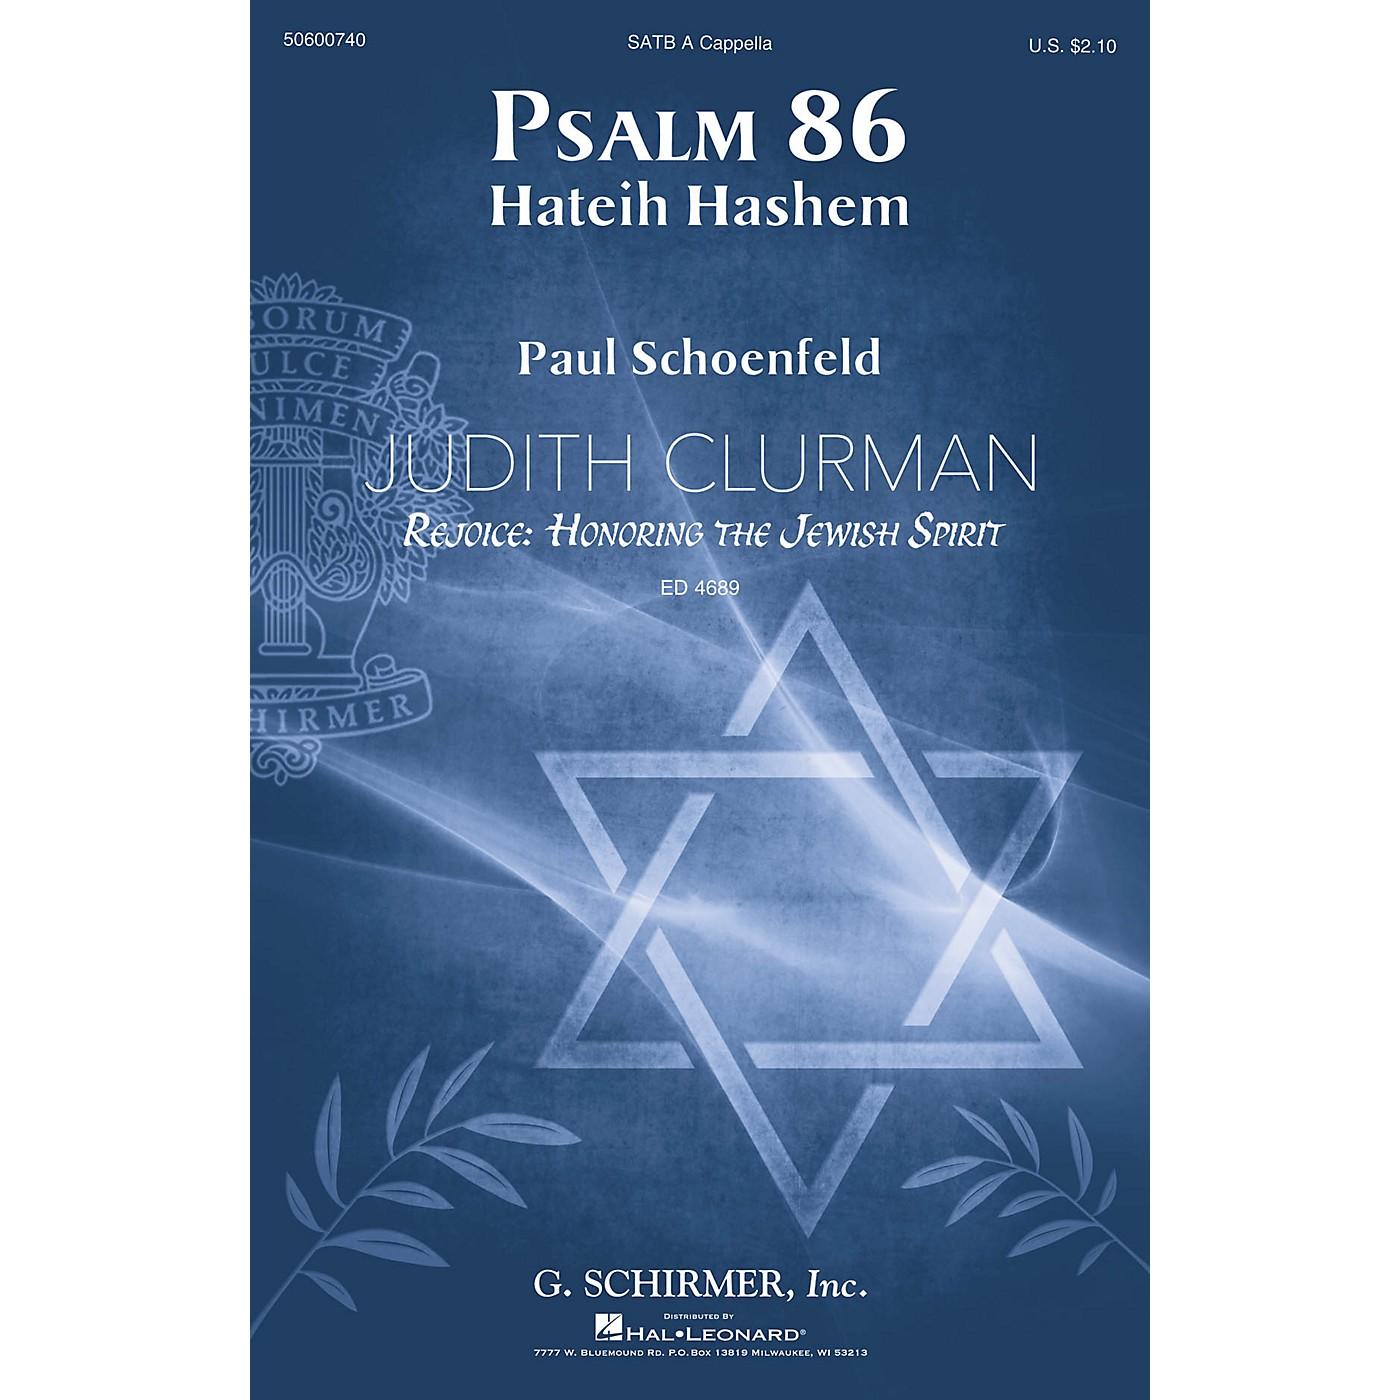 G. Schirmer Psalm 86 (Judith Clurman Rejoice: Honoring the Jewish Spirit Series) SATB A Cappella by Paul Schoenfeld thumbnail